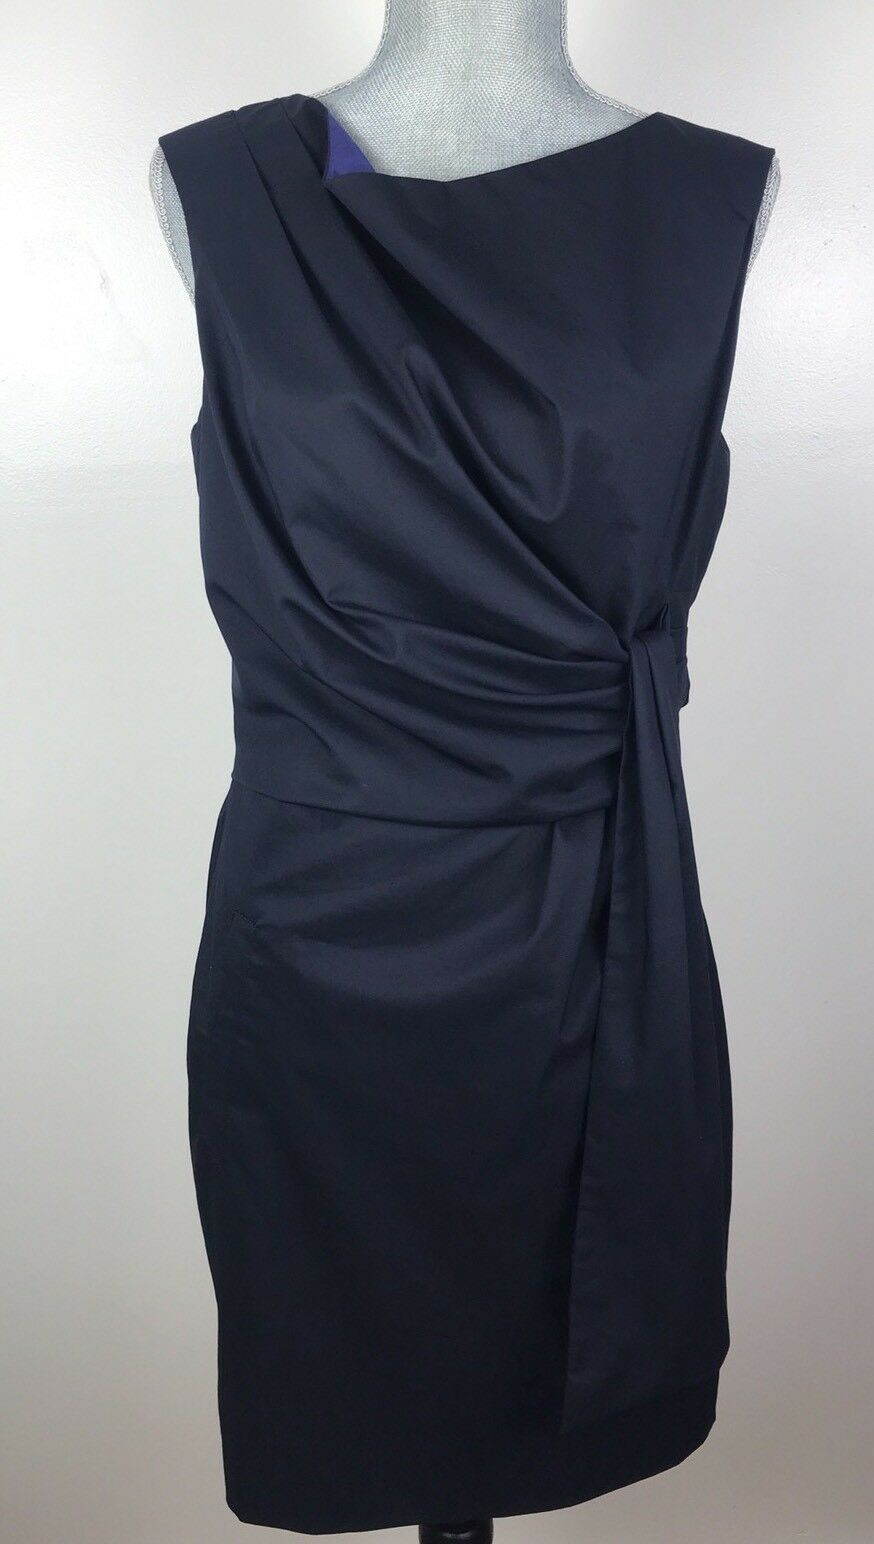 Diane Von Furstenberg Furstenberg Furstenberg SZ 8 bluee Amara Sleeveless Dress Sash Knee Length f6ee4e